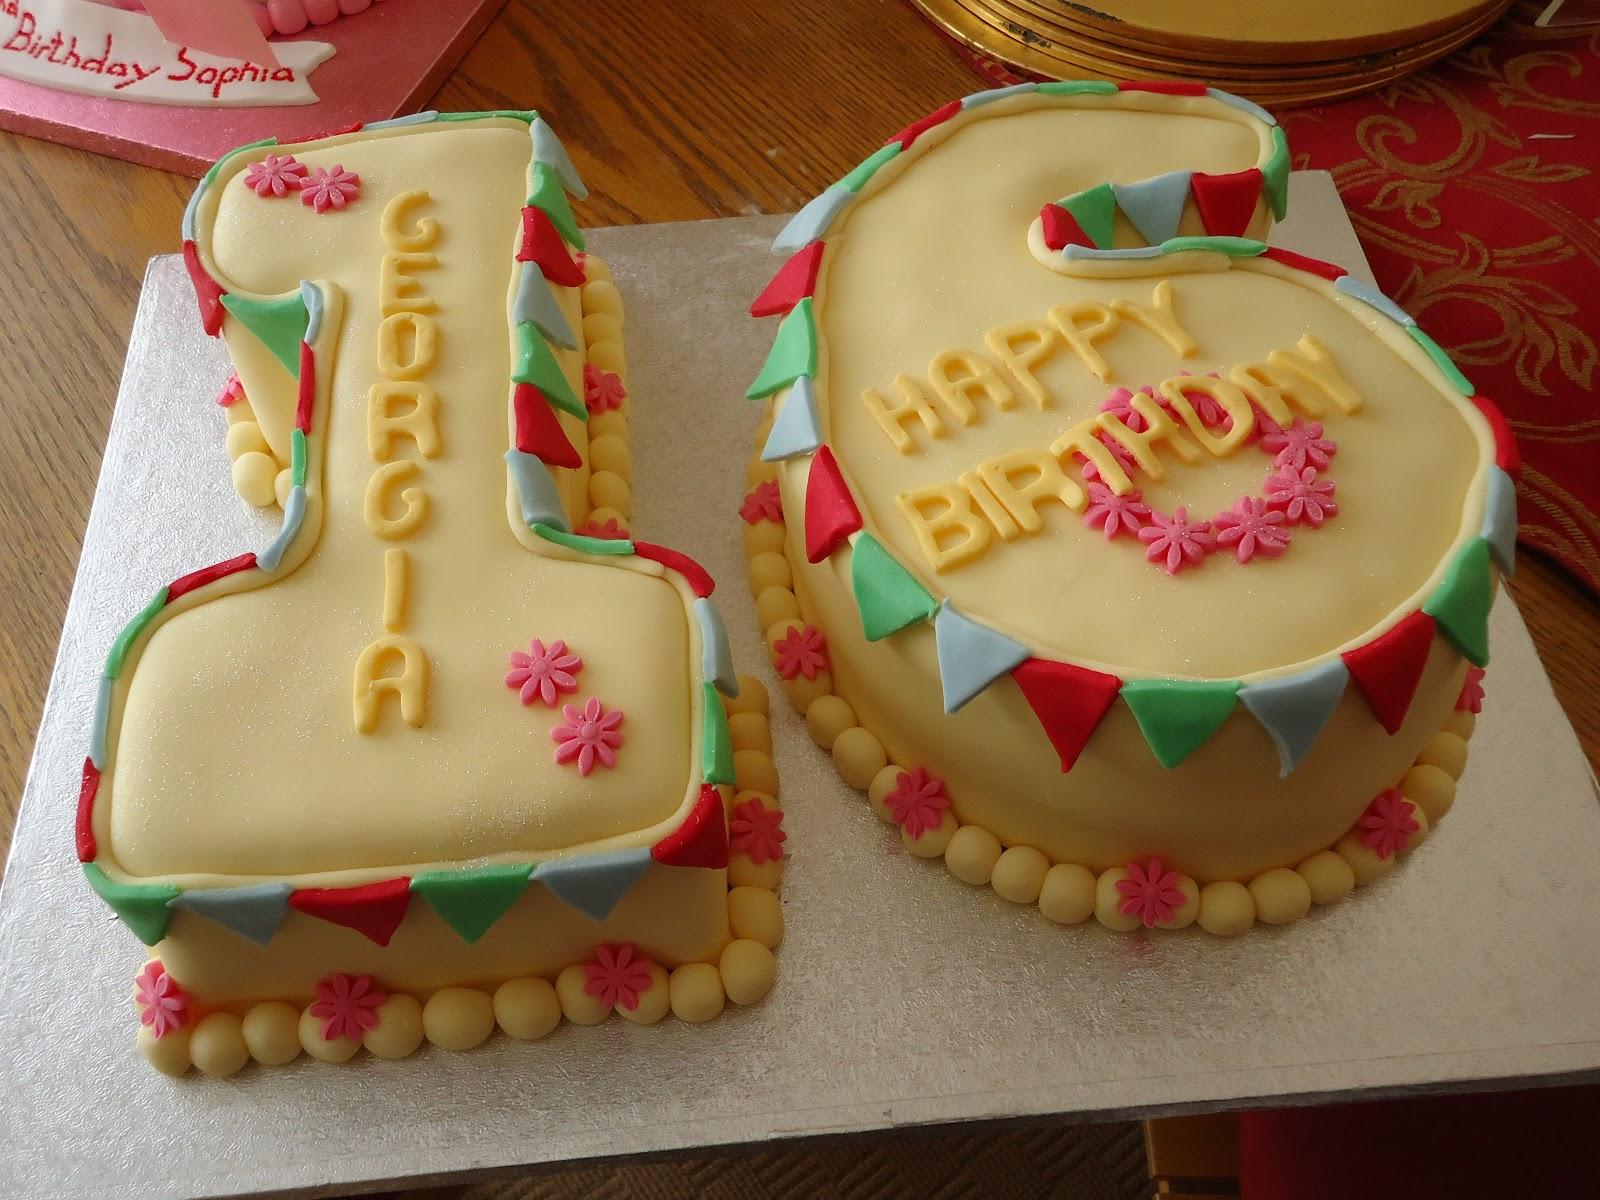 Cake Designs 16th Birthday Boy : Sweet 16, Festival Cake Debs Dainty Cakes